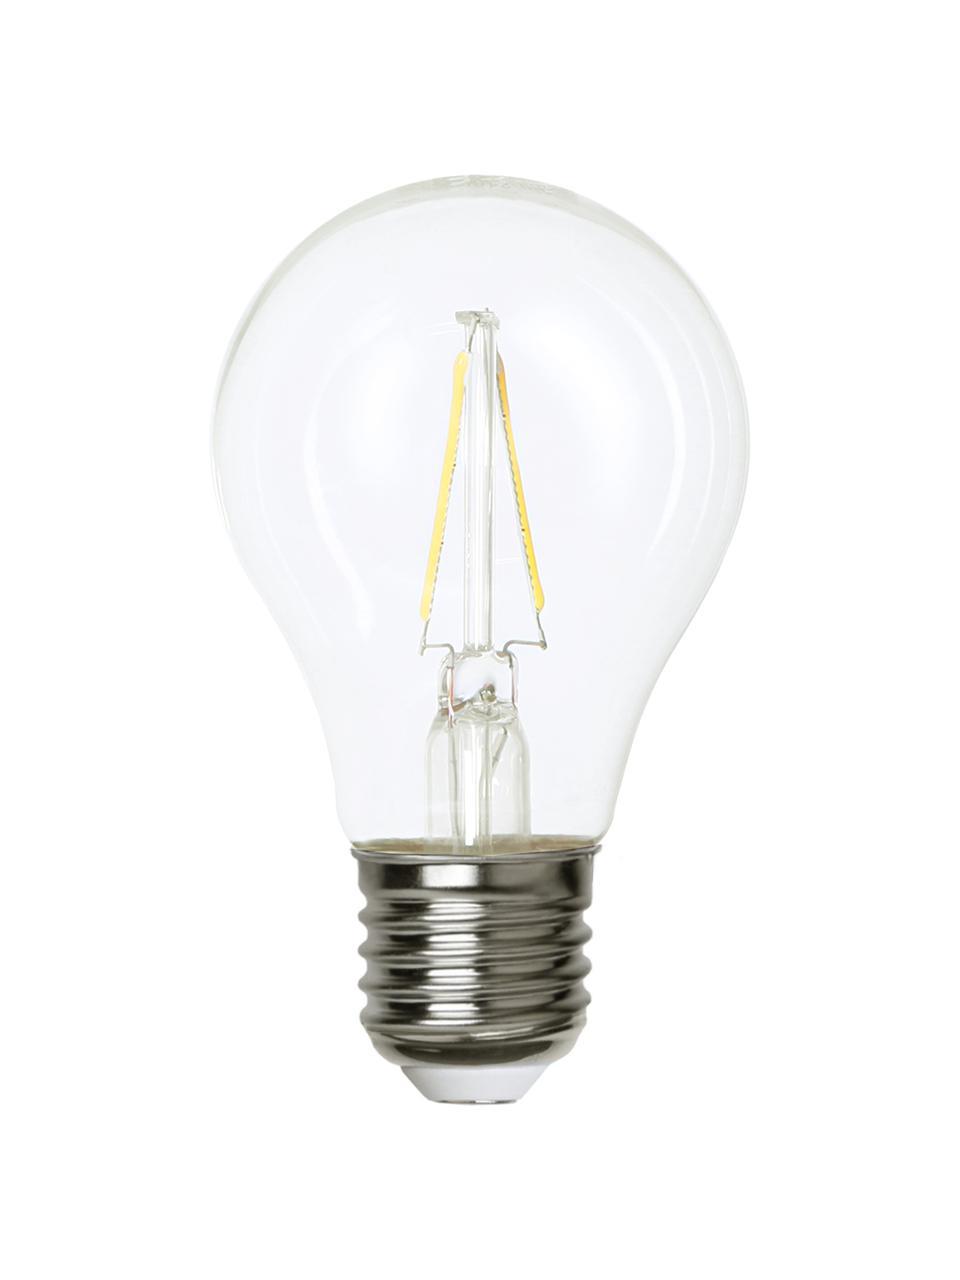 E27 Leuchtmittel, 220lm, warmweiß, 1 Stück, Leuchtmittelschirm: Glas, Leuchtmittelfassung: Aluminium, Transparent, Ø 6 x H 11 cm